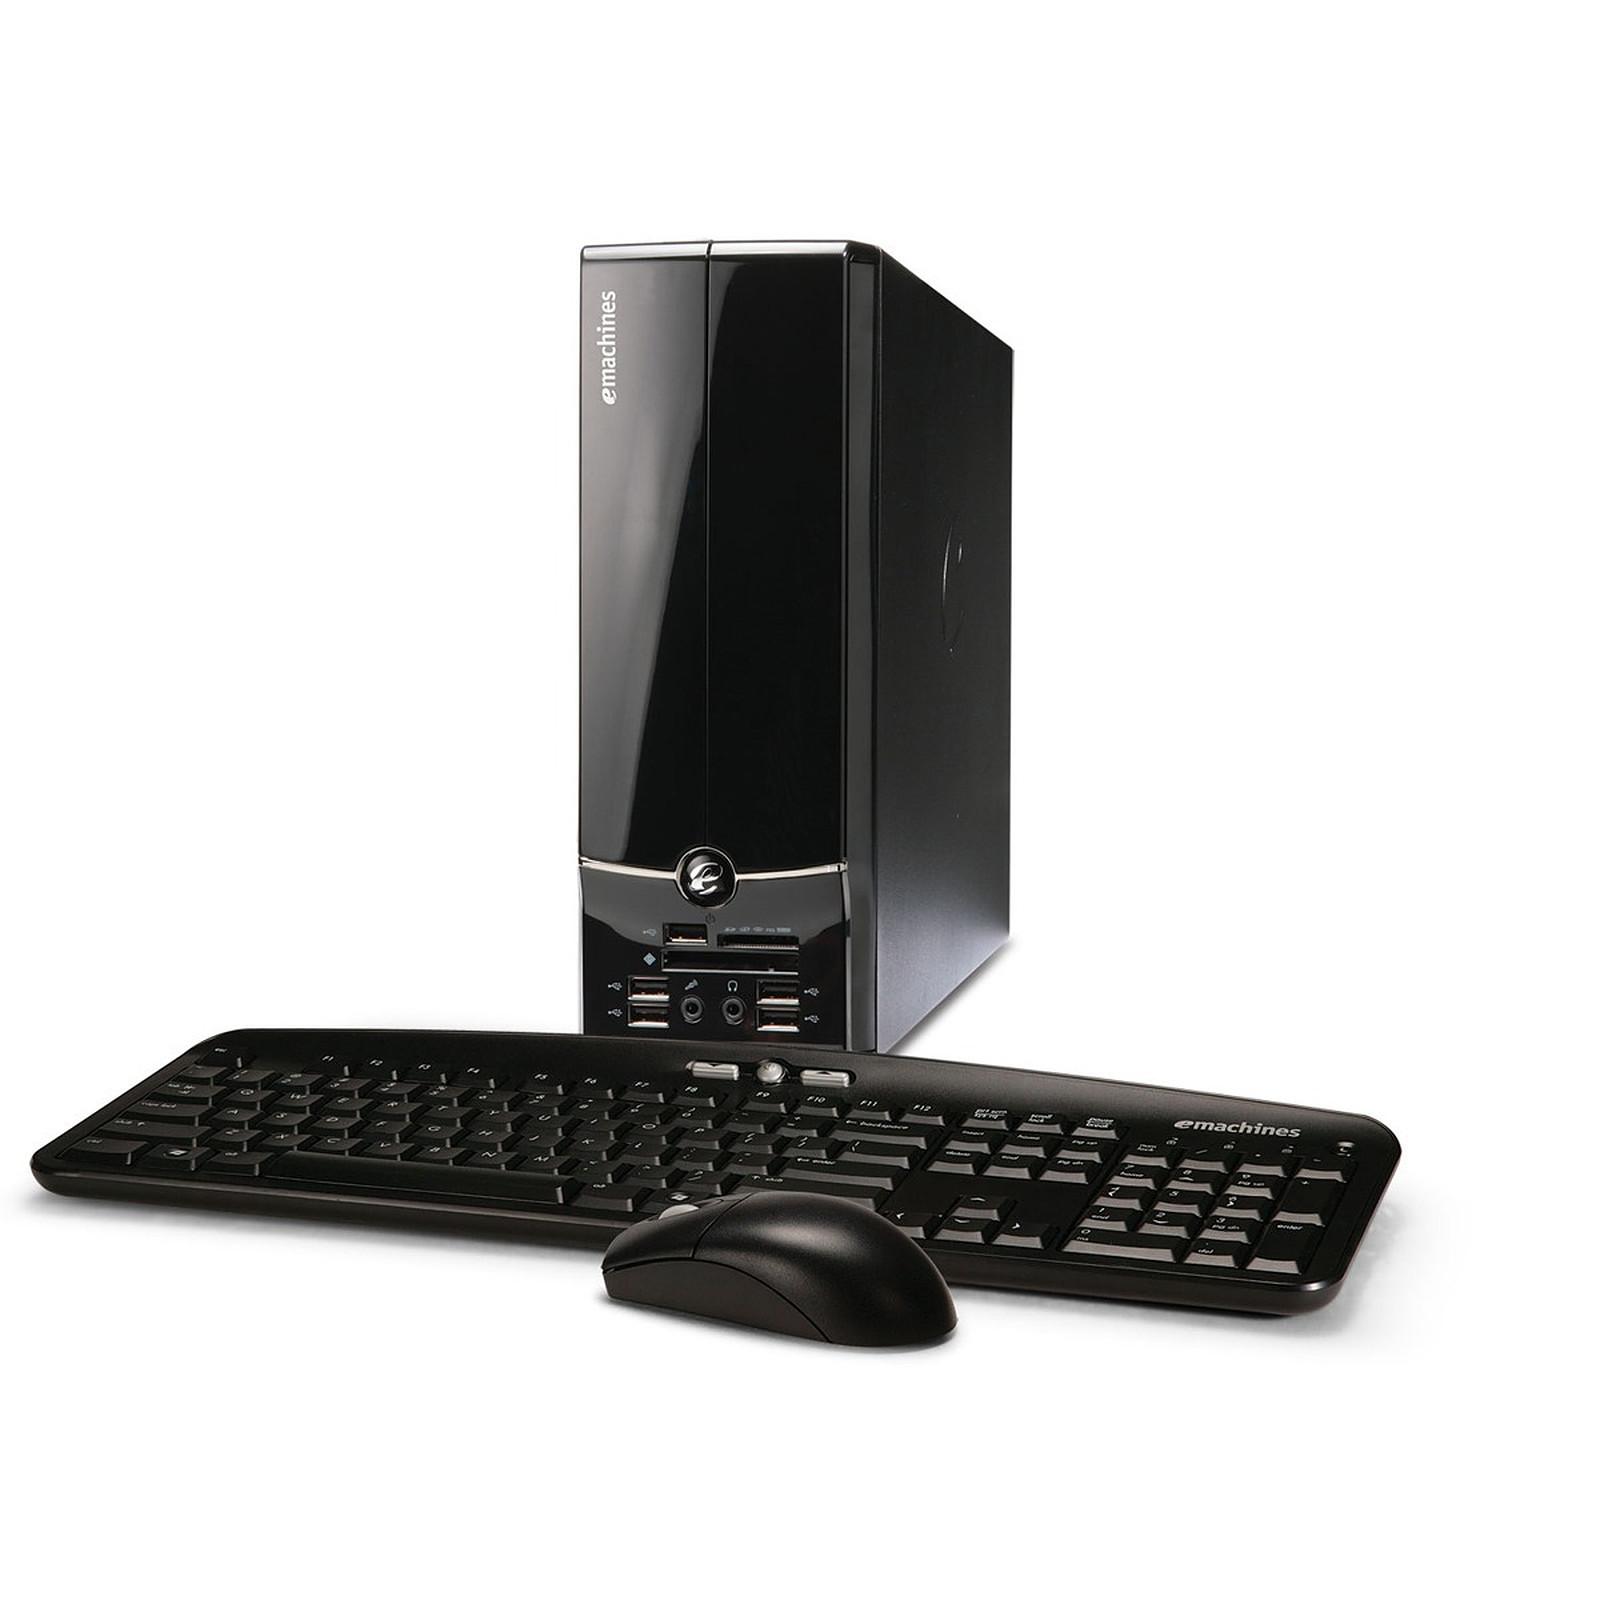 Acer eMachines EL1352-056